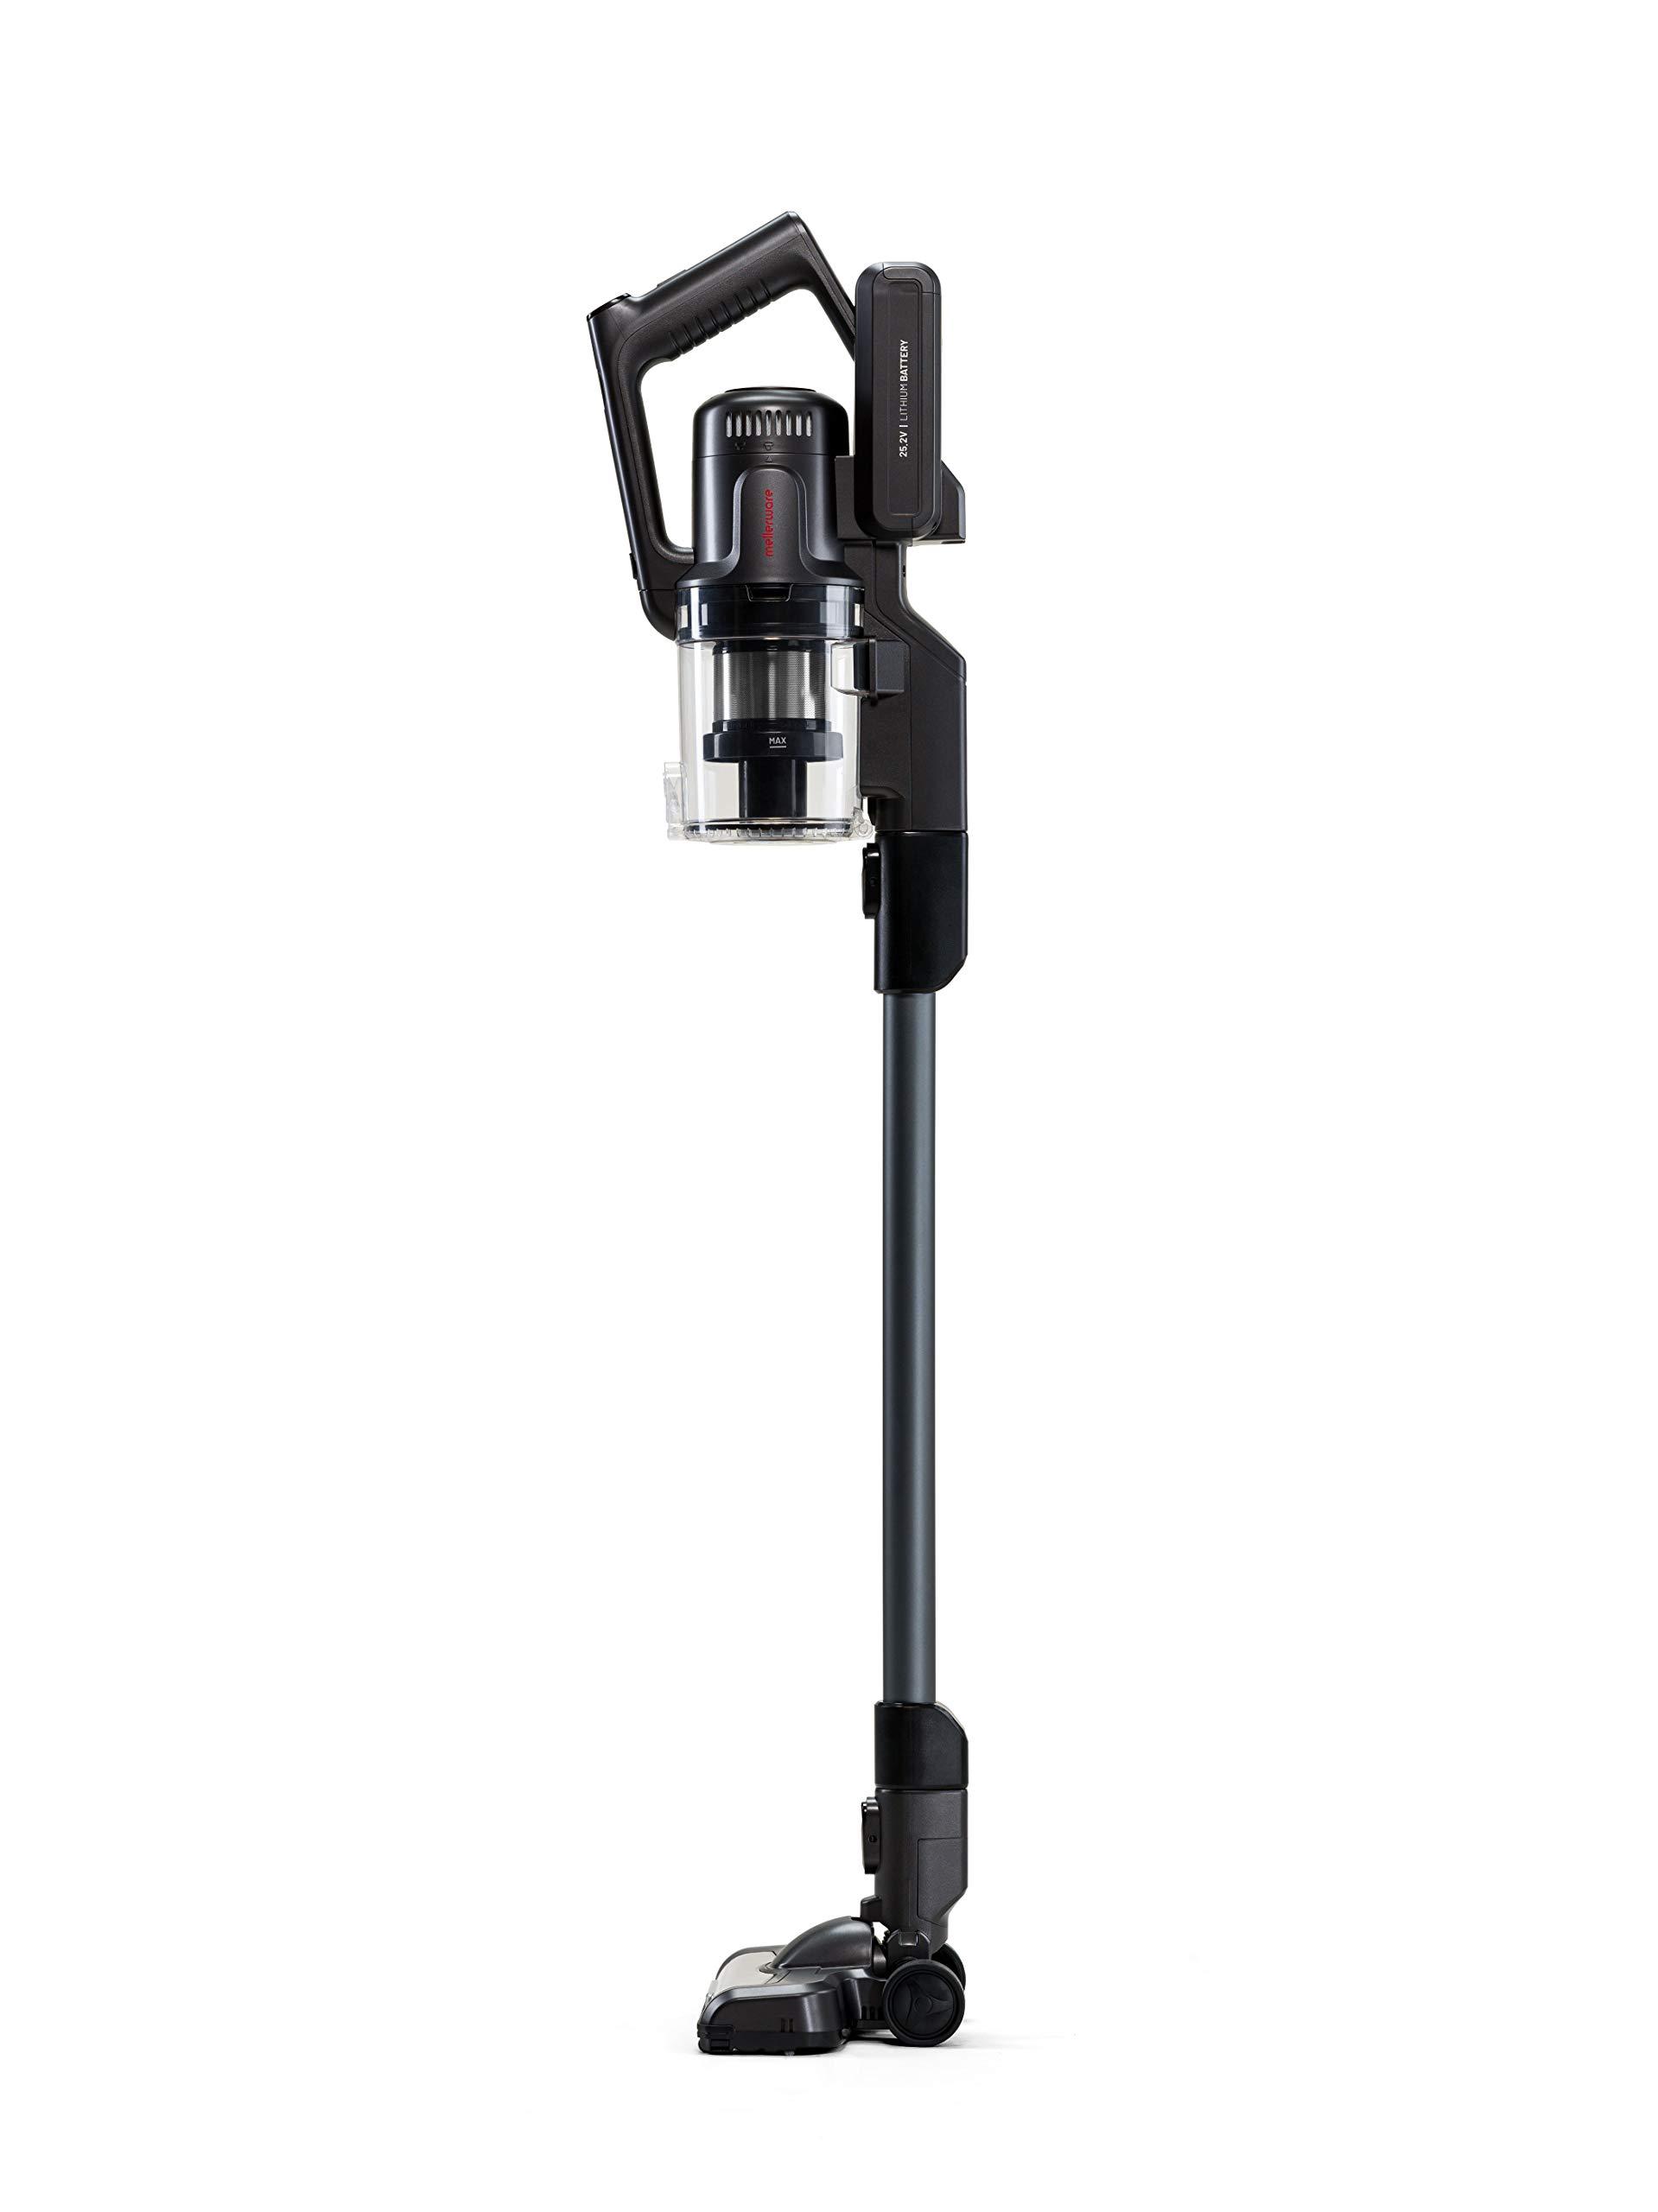 Mellerware Aspirador Vertical Inal/ámbrico Rider Pro 400 W Motor Brushless 22KPA de succi/ón Rider Pro